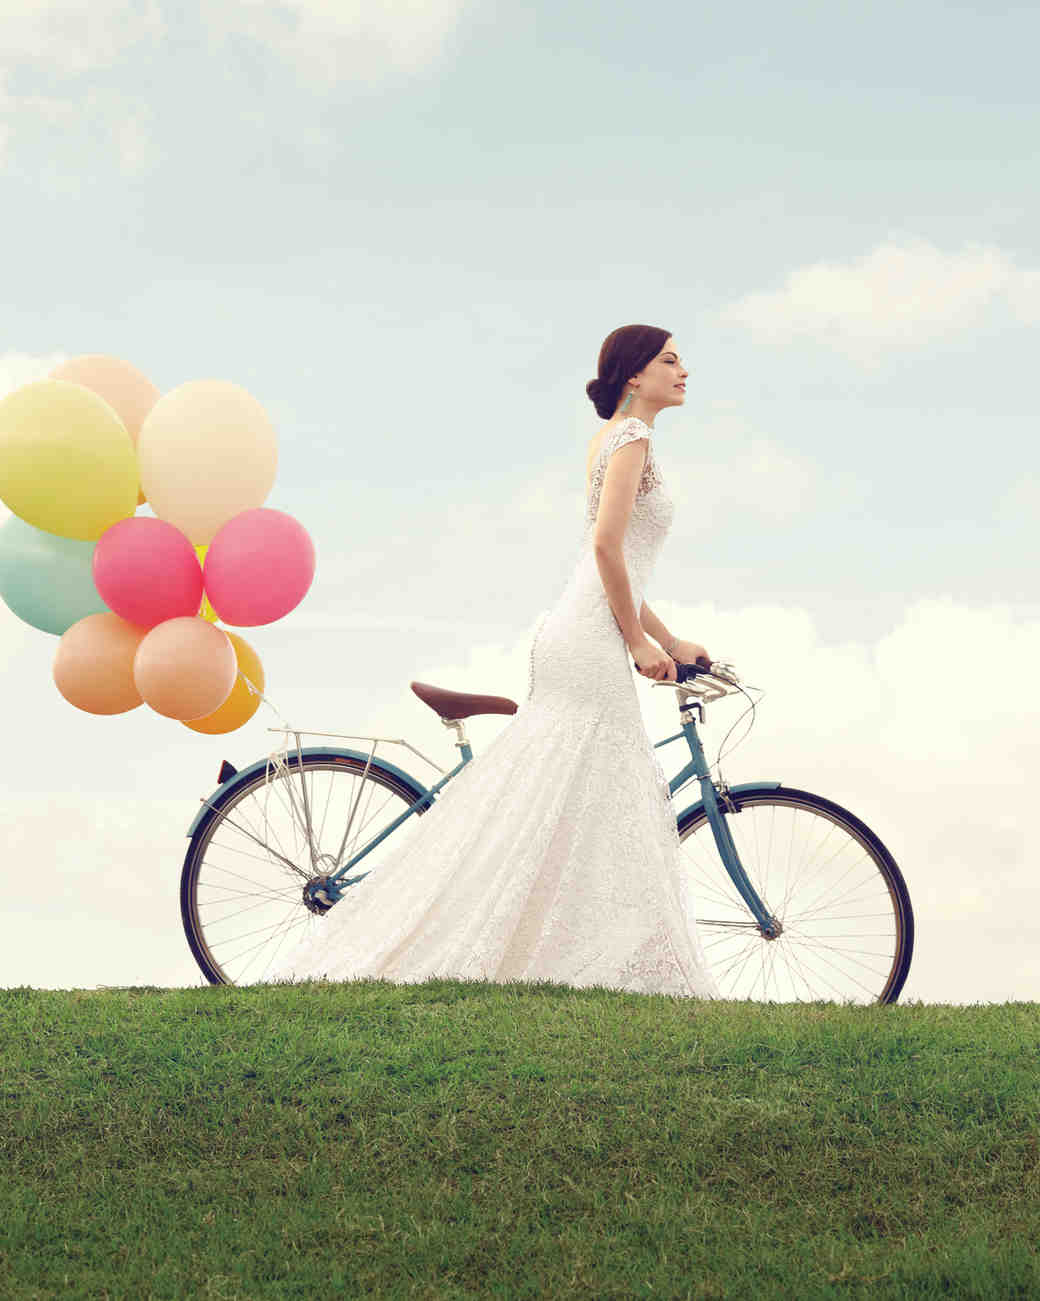 wedding-dress-4-mwd108453.jpg